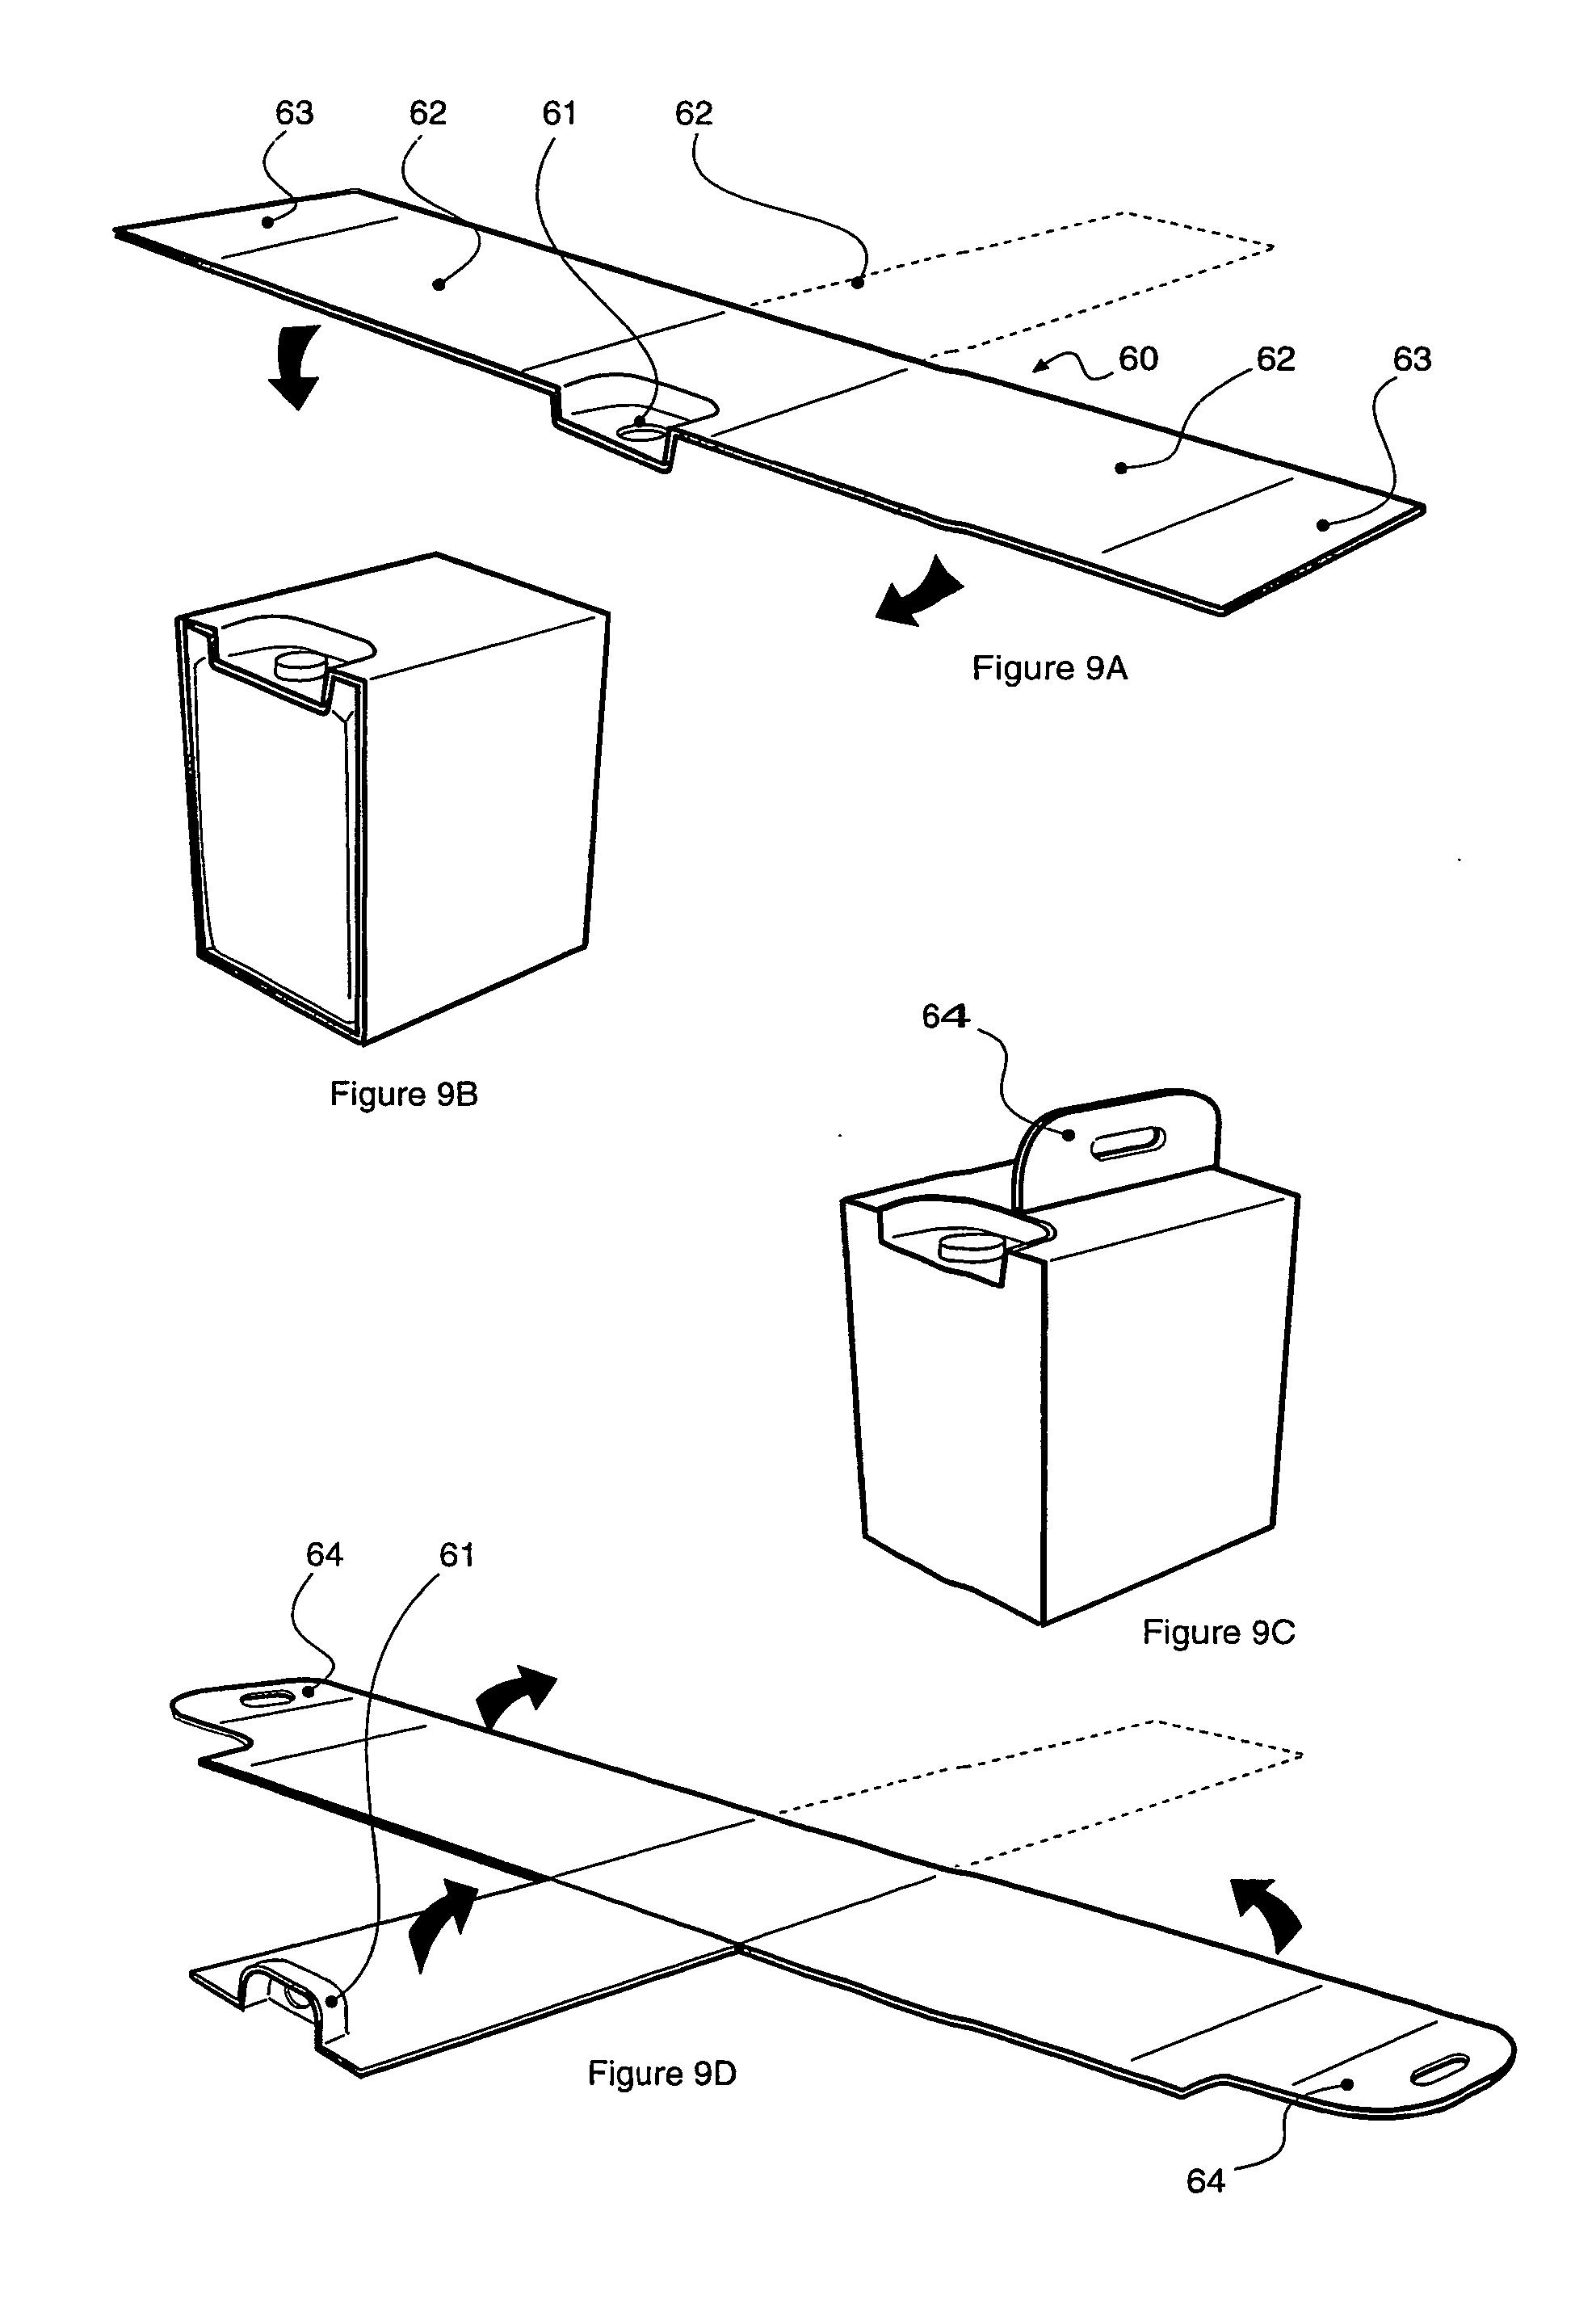 2000 jeep wrangler heater wiring diagram 2000 jeep wrangler heater blower wiring schematic